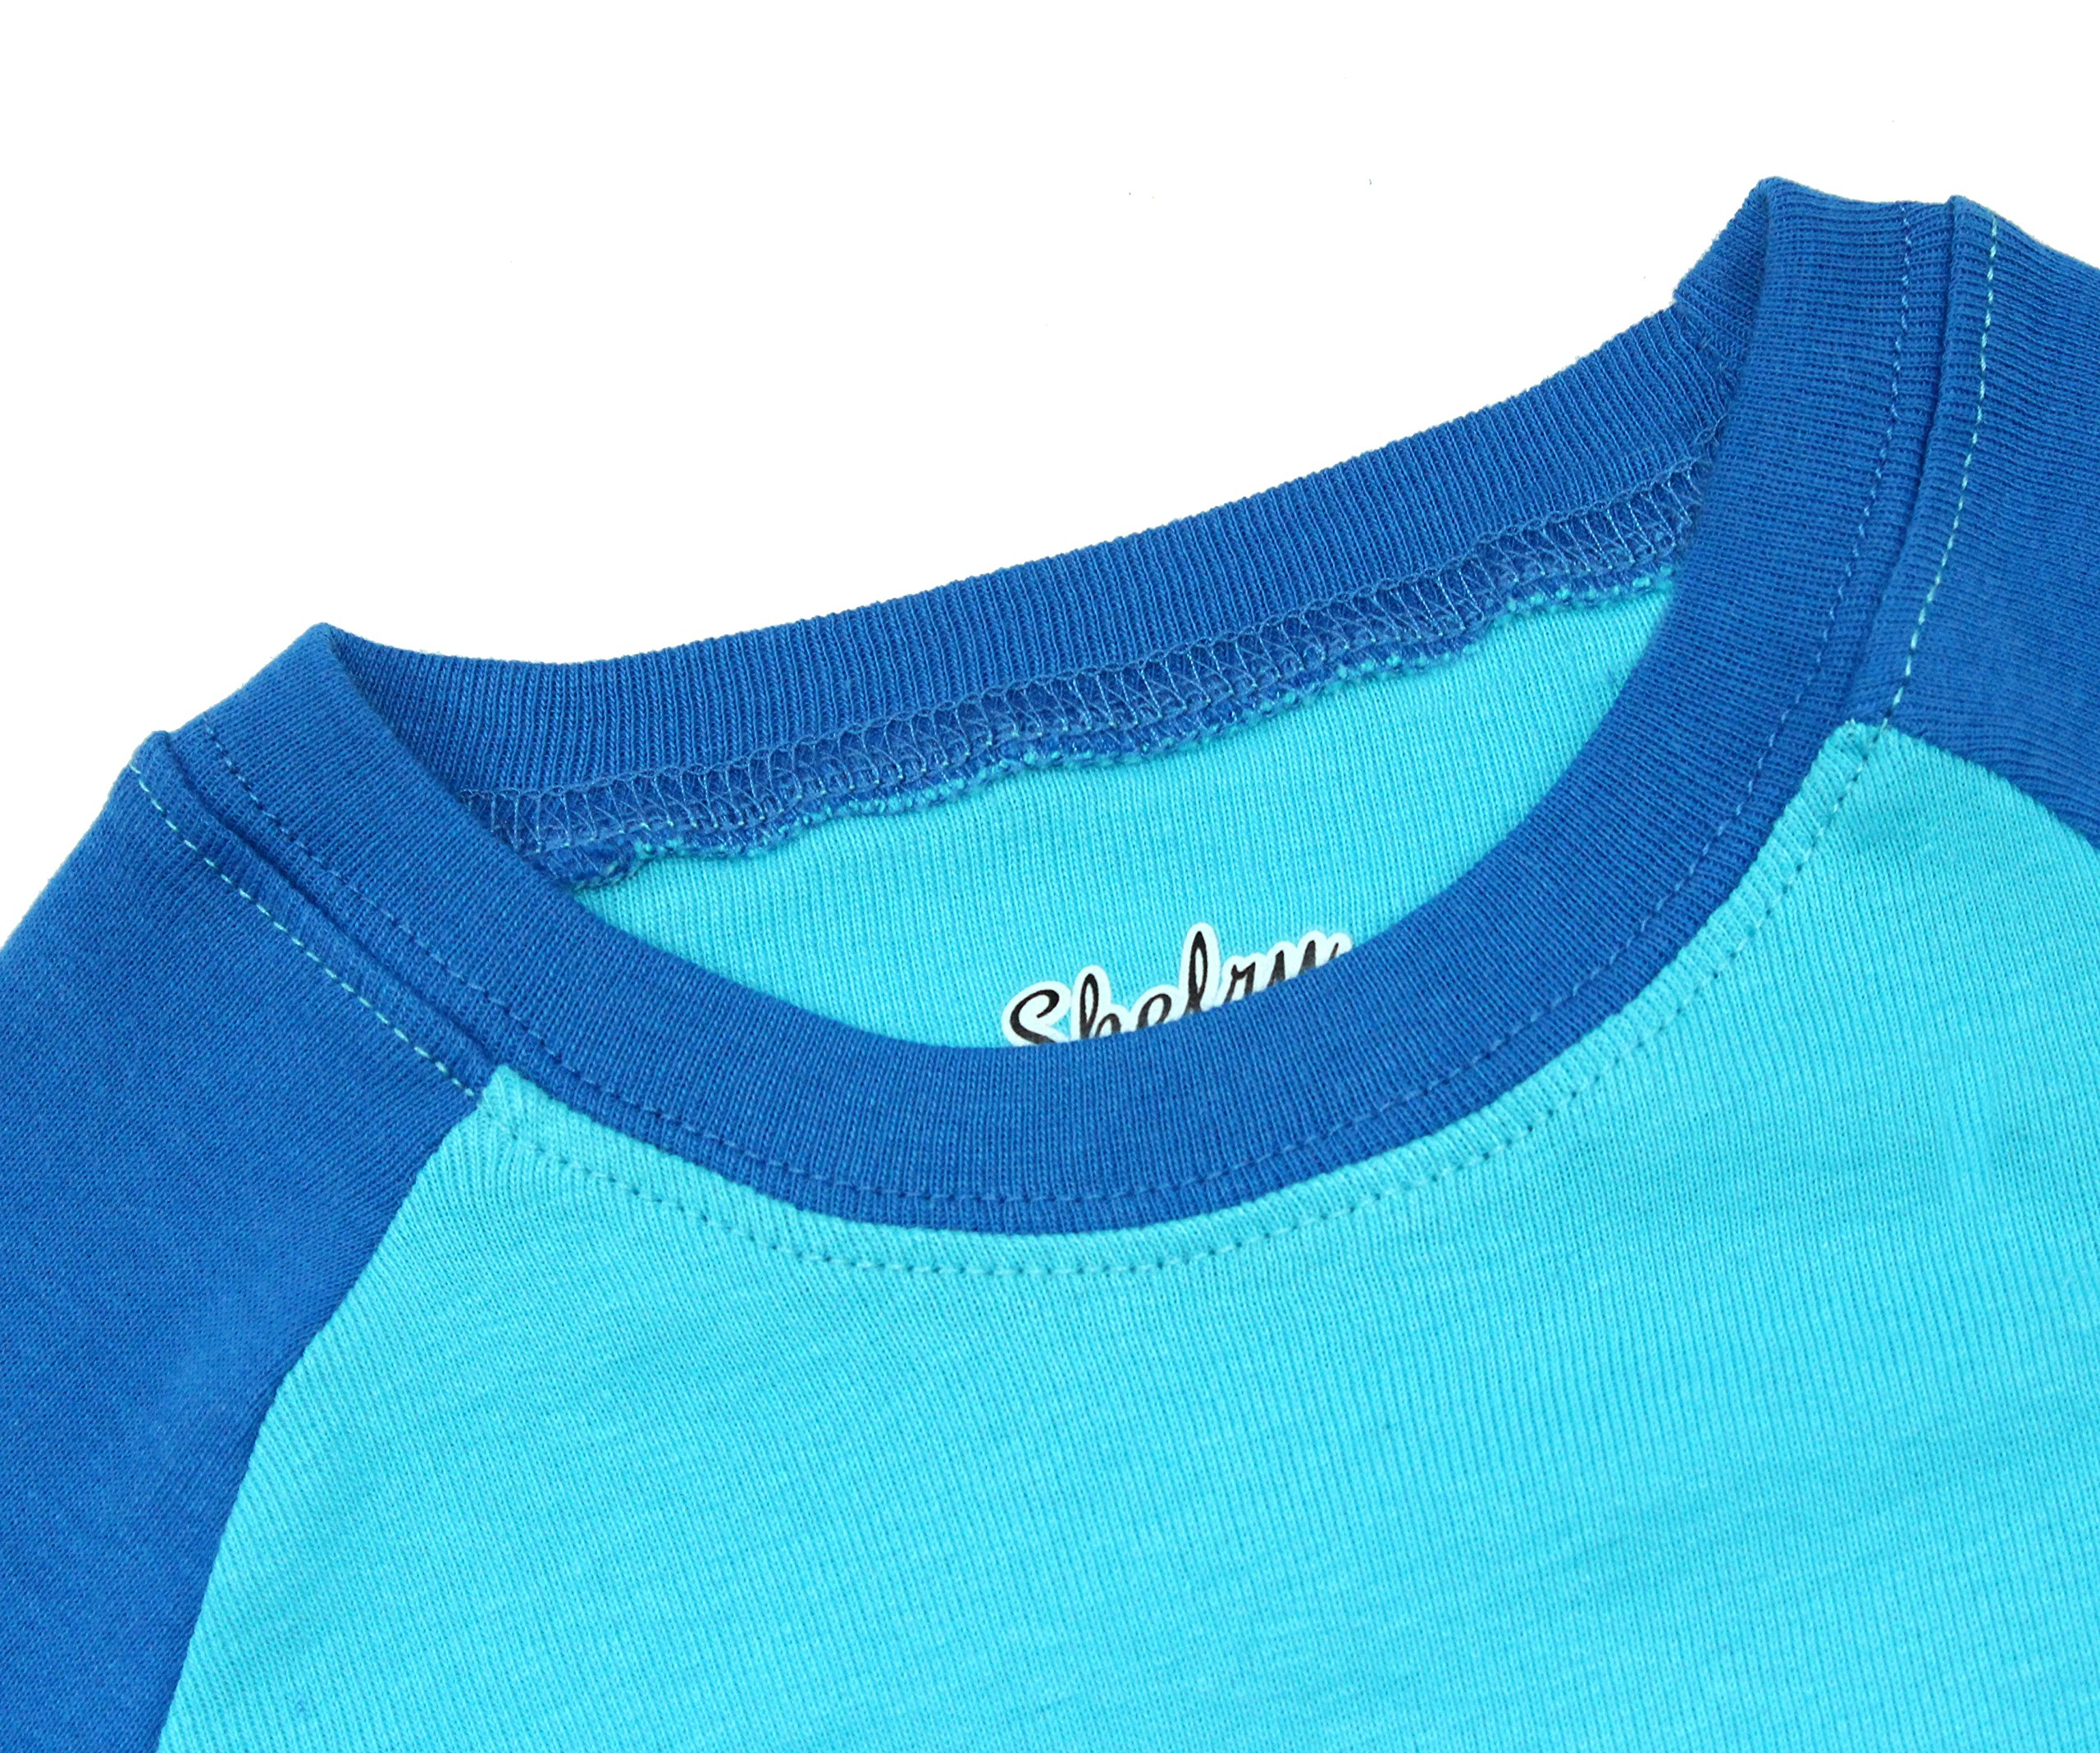 Boys Pajamas Boys Dinosaur Little Kid Shorts Set 100% Cotton Clothes Short Sleeves Sleepwear 8Y by shelry (Image #6)